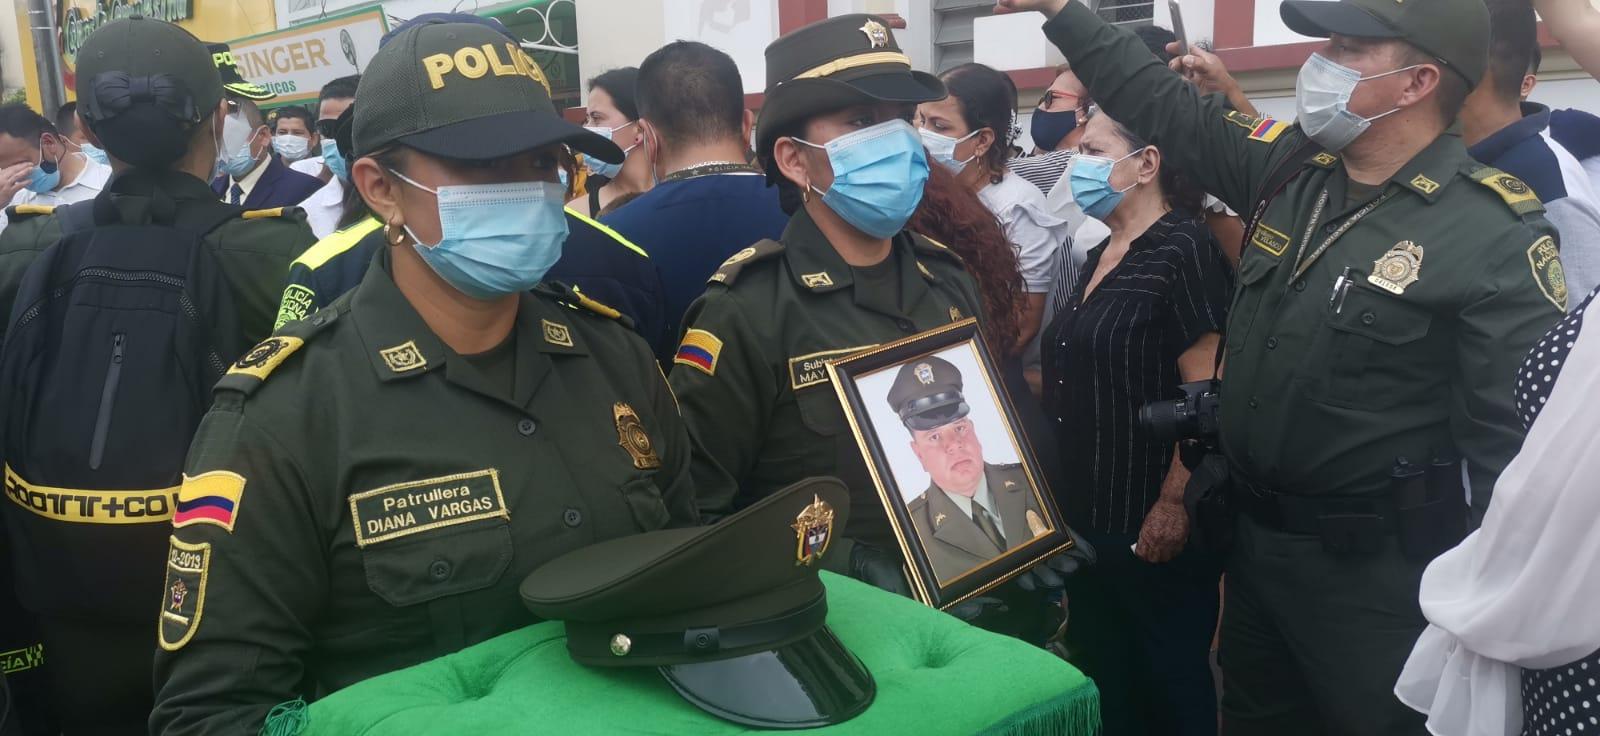 Con homenaje despidieron al patrullero tolimense asesinado en Bogotá 3